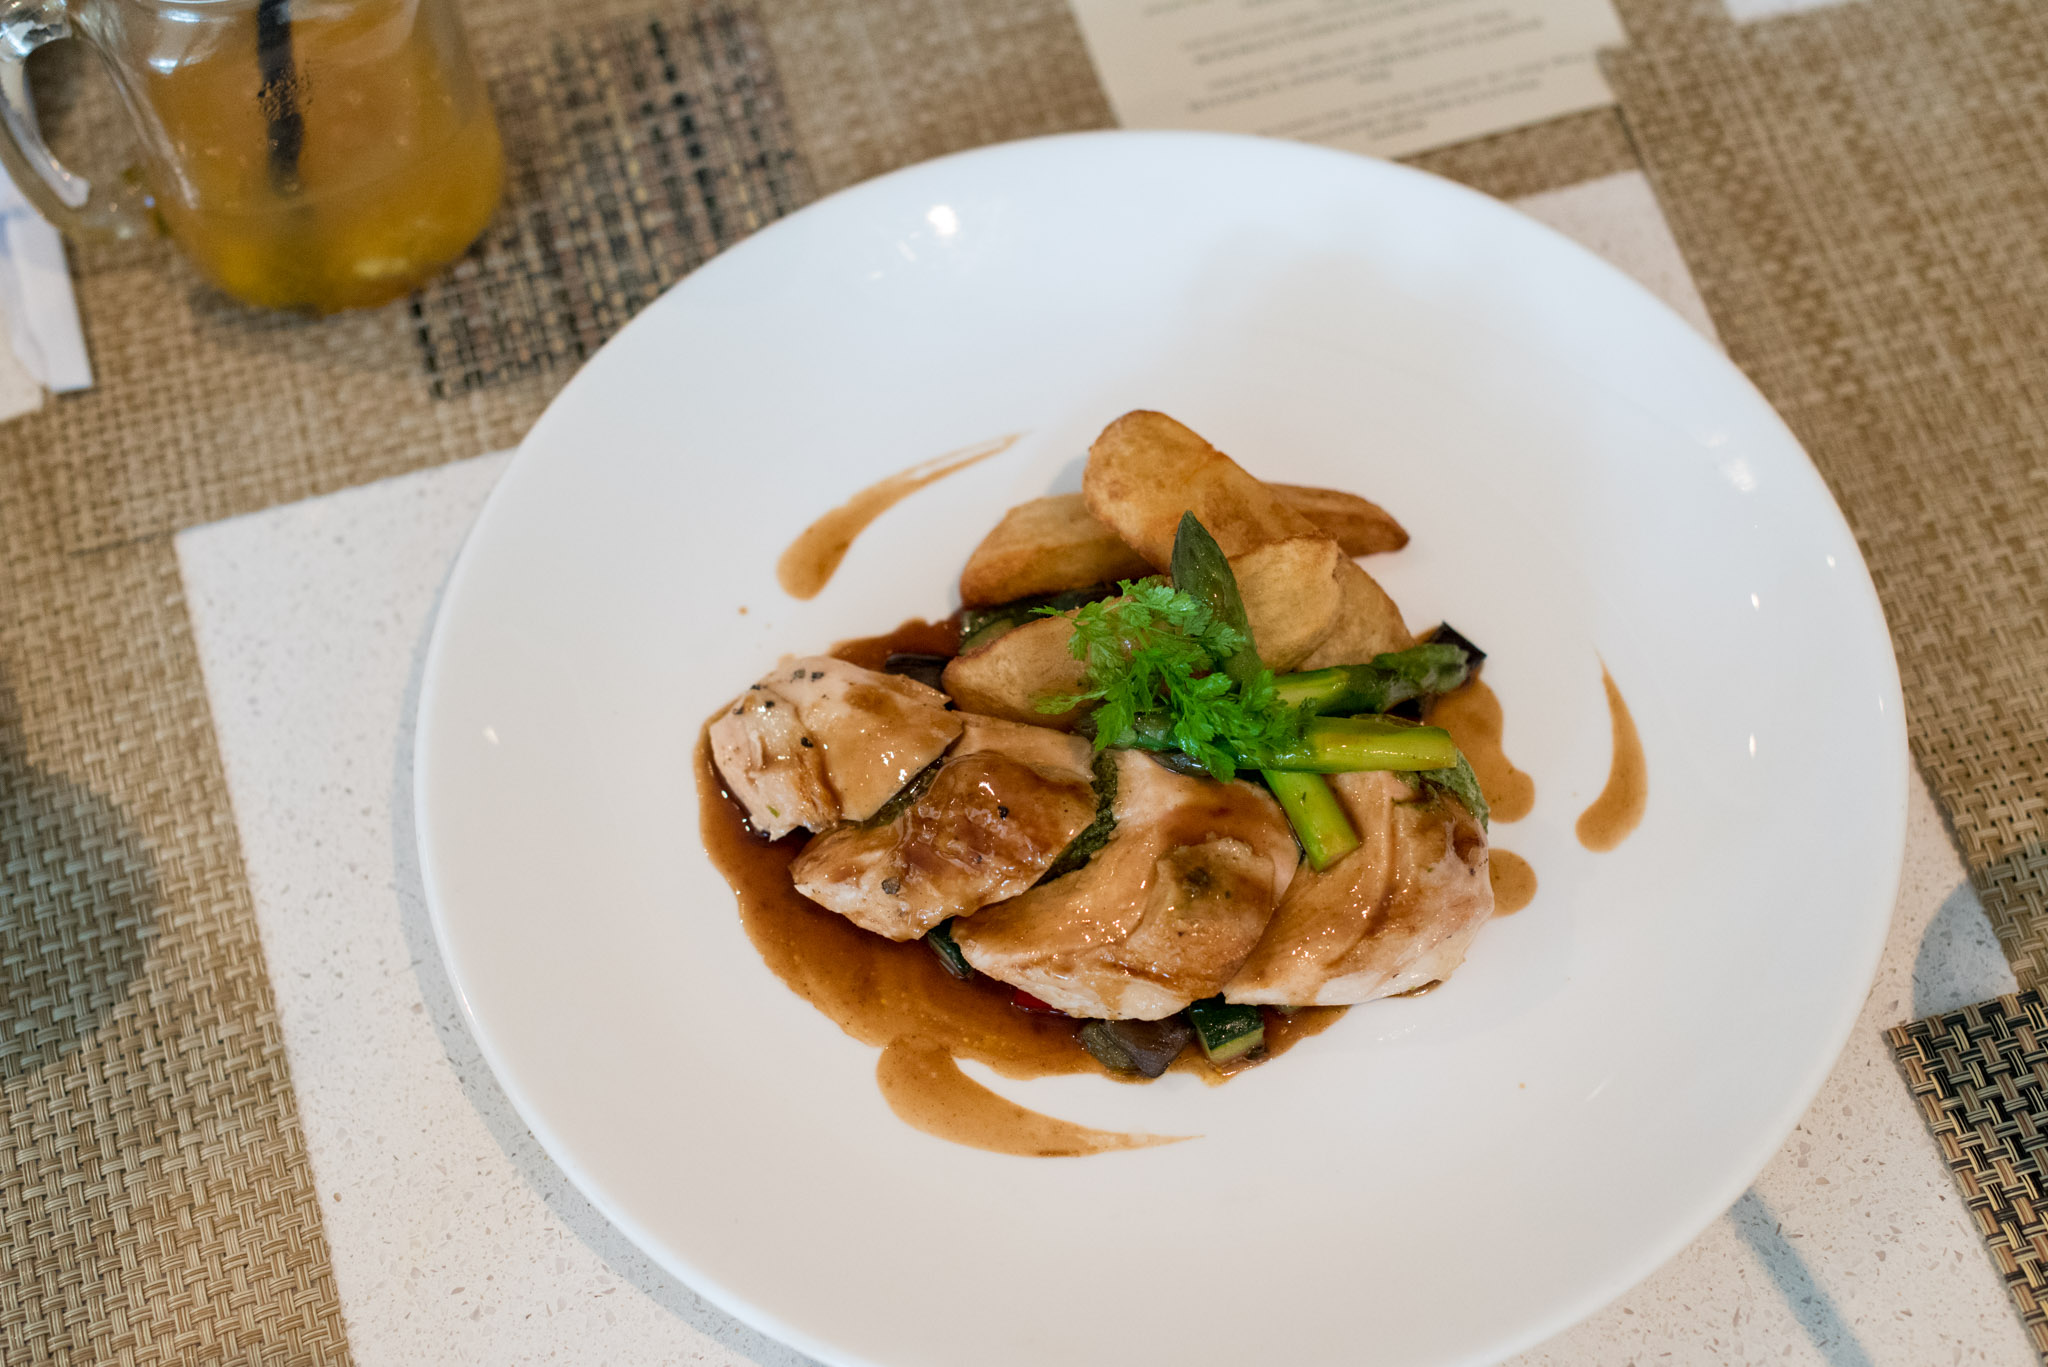 Spinach Stuffed Roasted Chicken Breast, Vegetables Caponata, Rocket Pesto Sauce  The Waterfall - Shangri-La Singapore